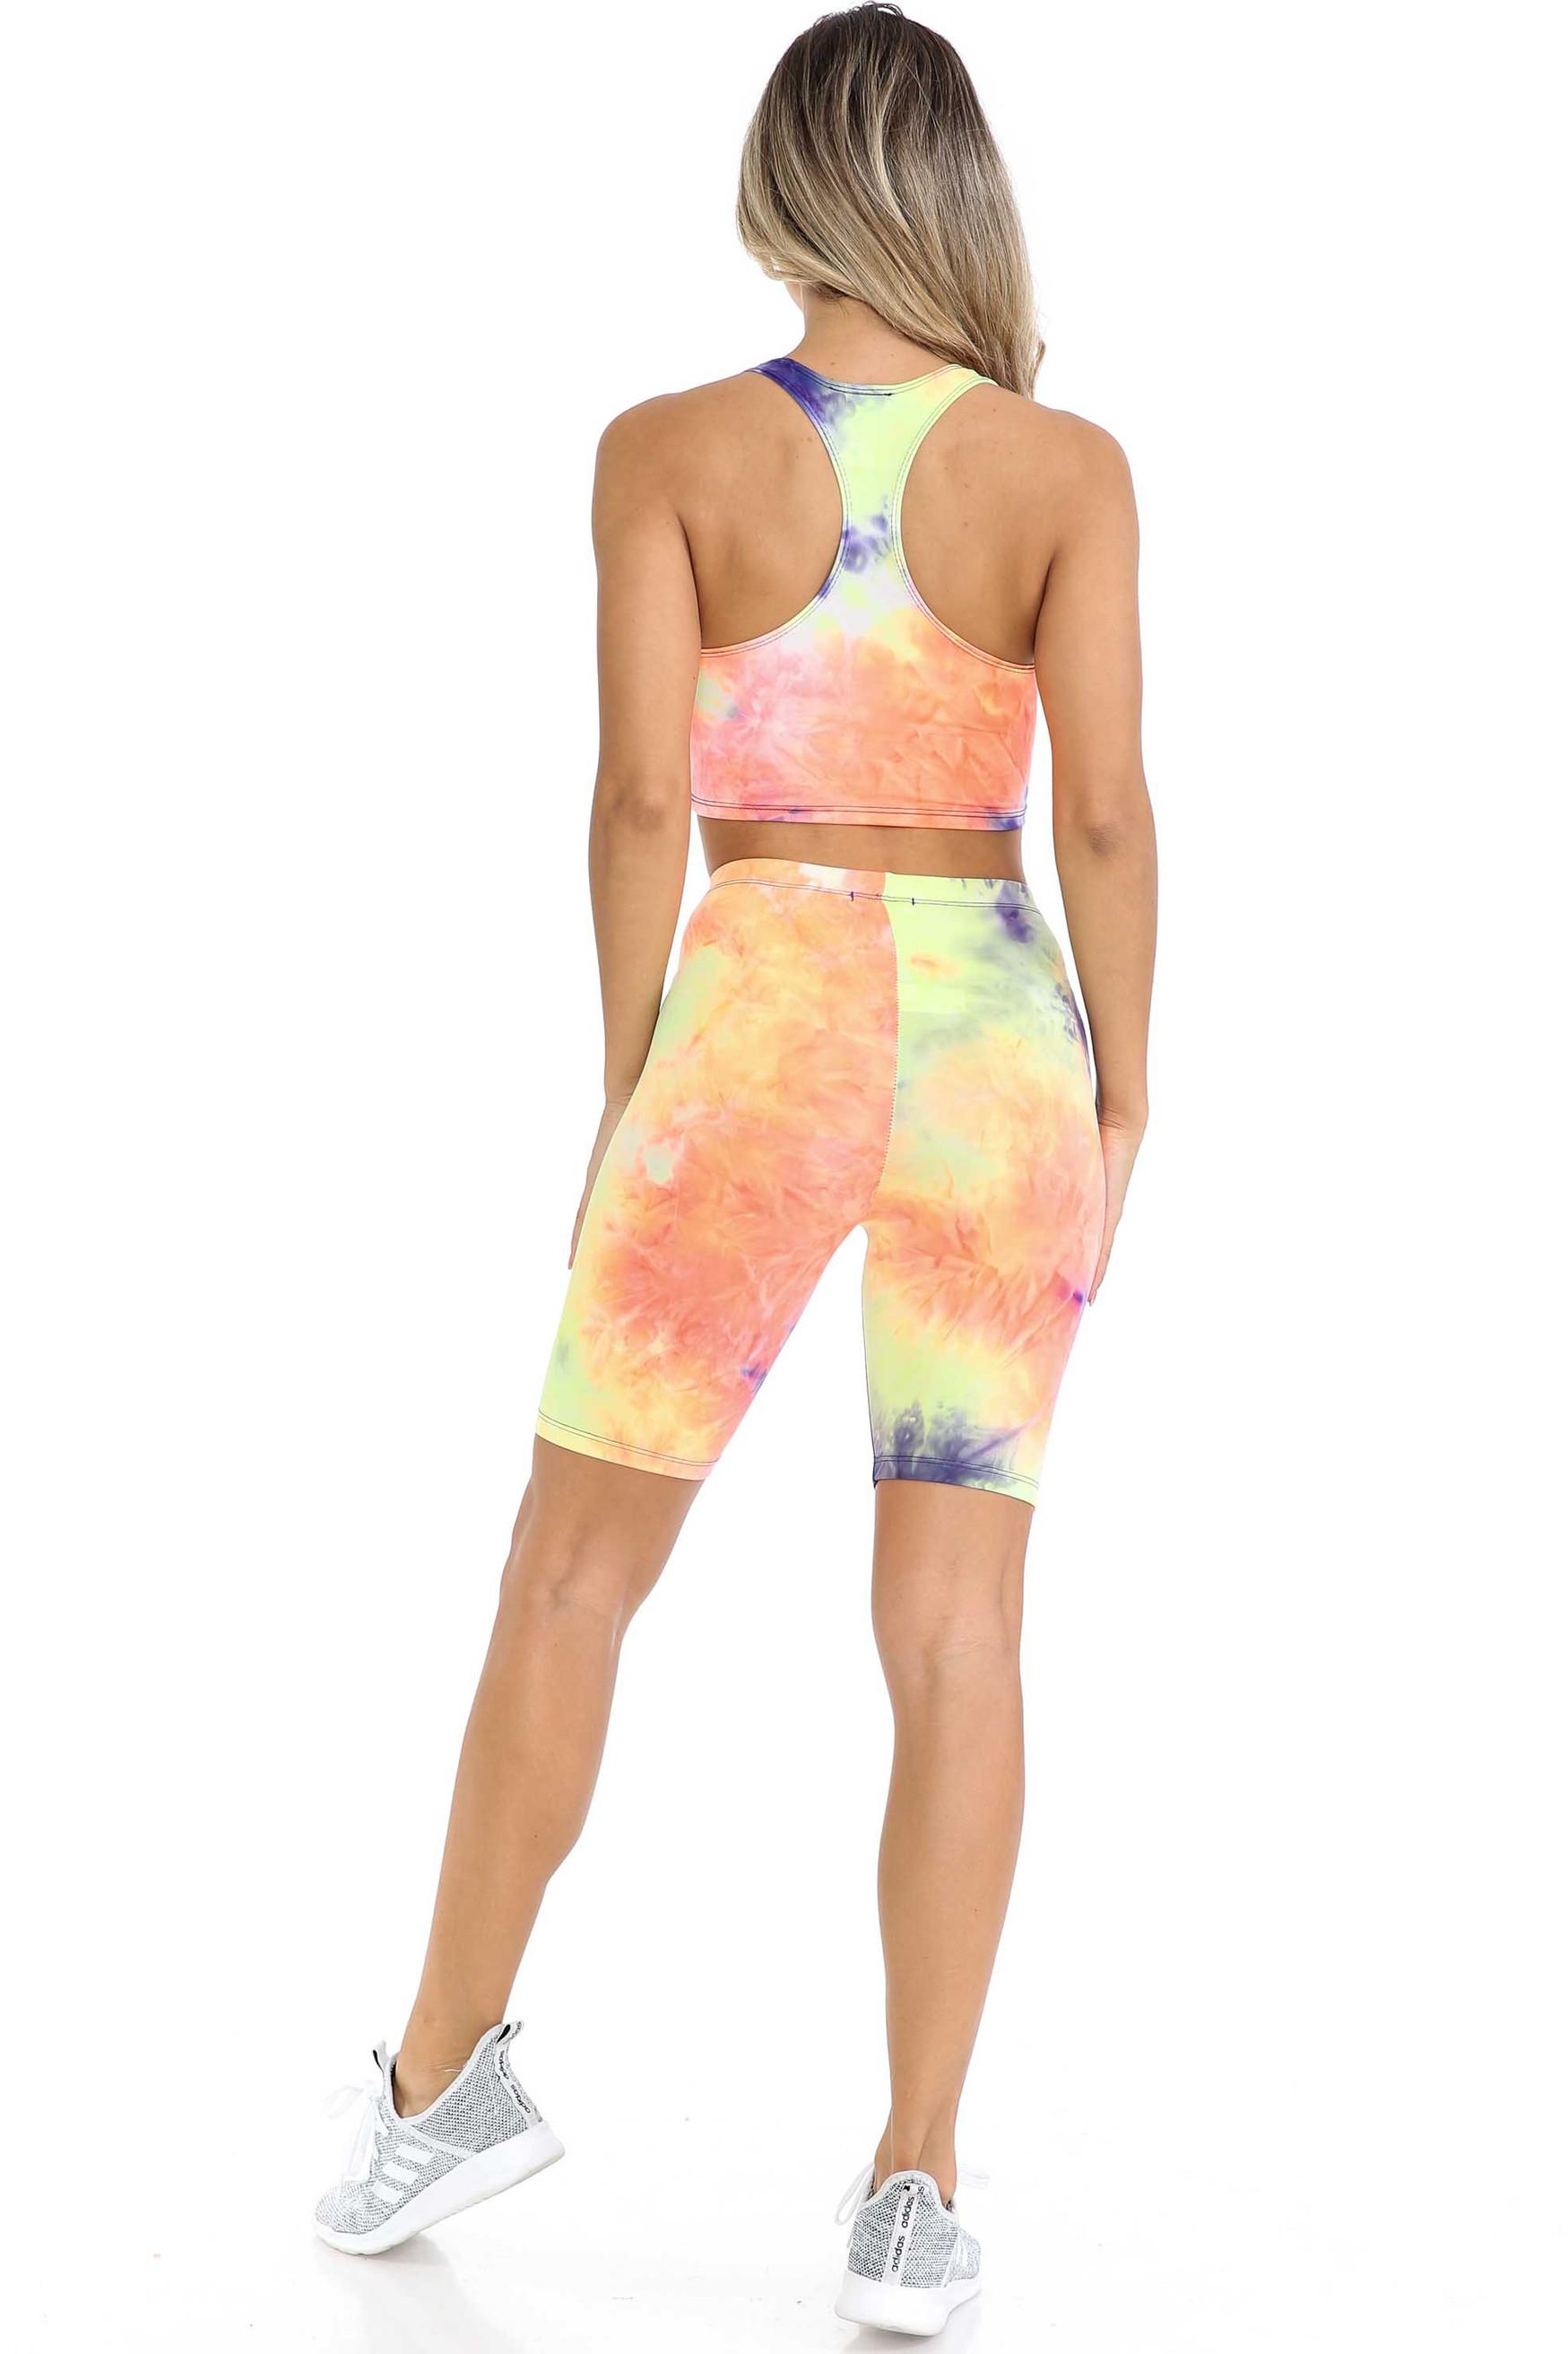 Indigo Tie Dye 2 Piece Shorts and Cropped Bra Top Set